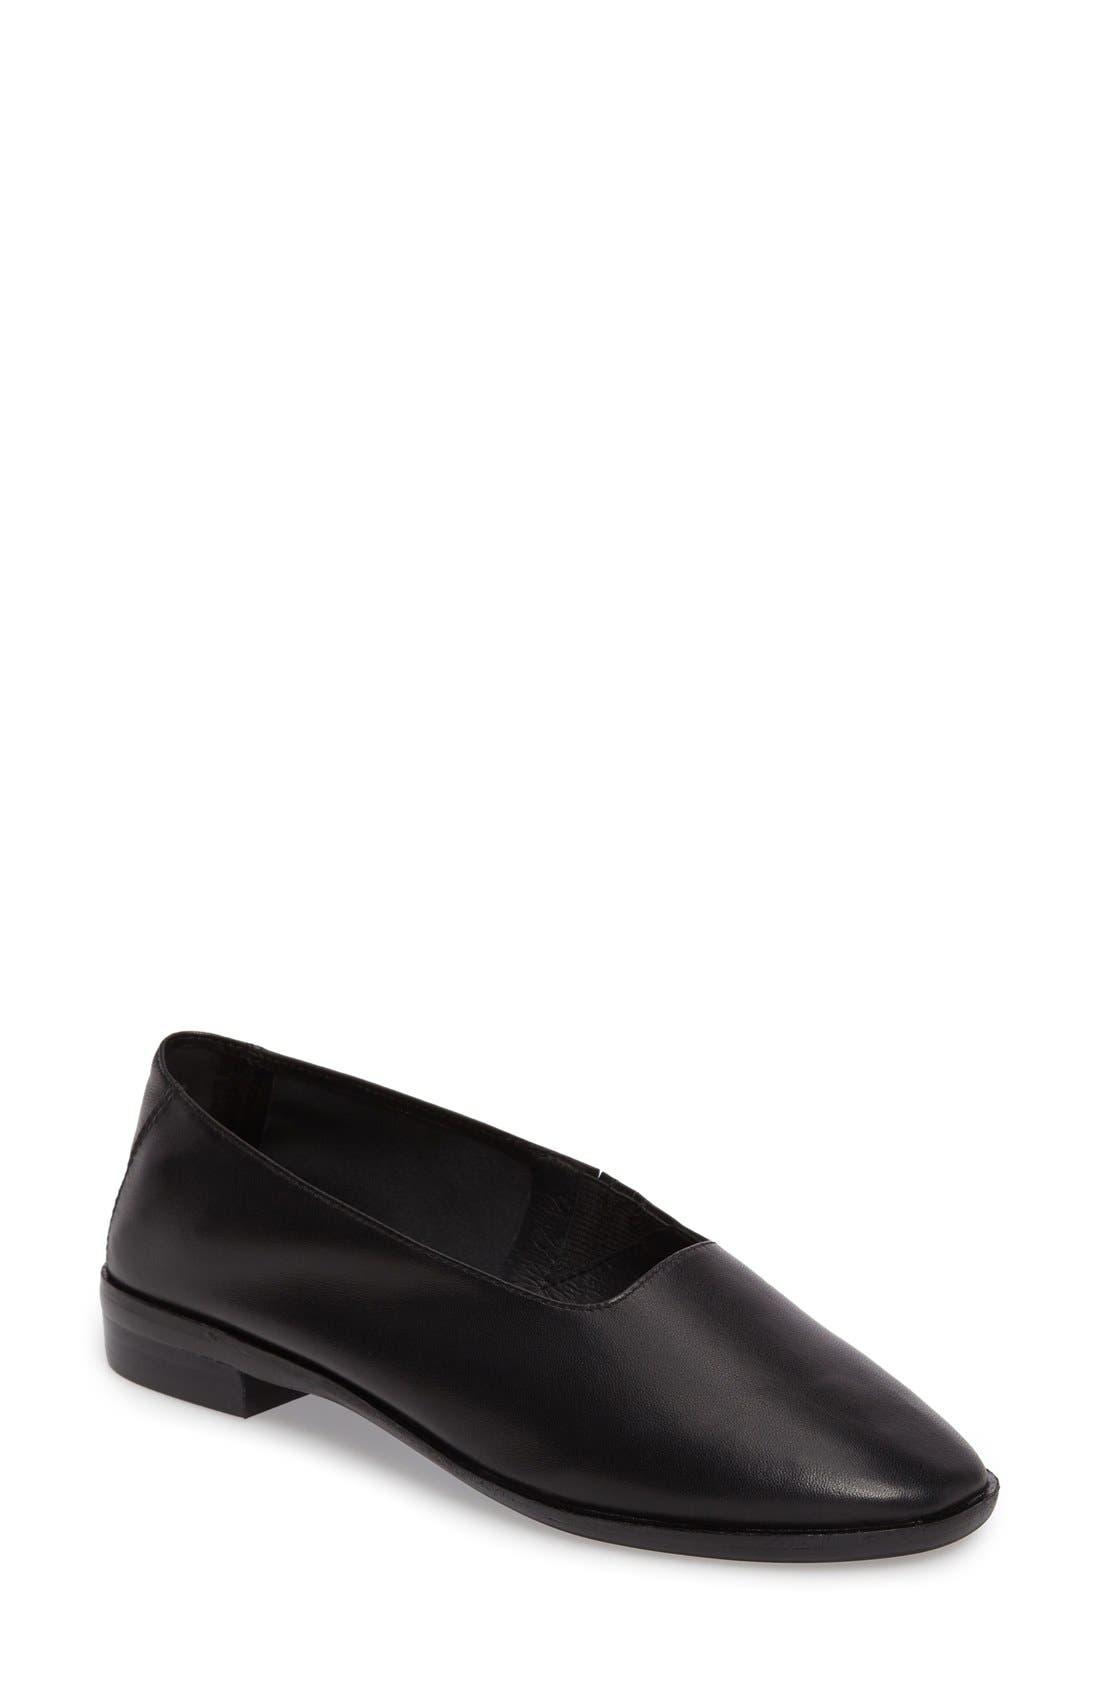 'Jordan' Flat,                         Main,                         color, Black Leather